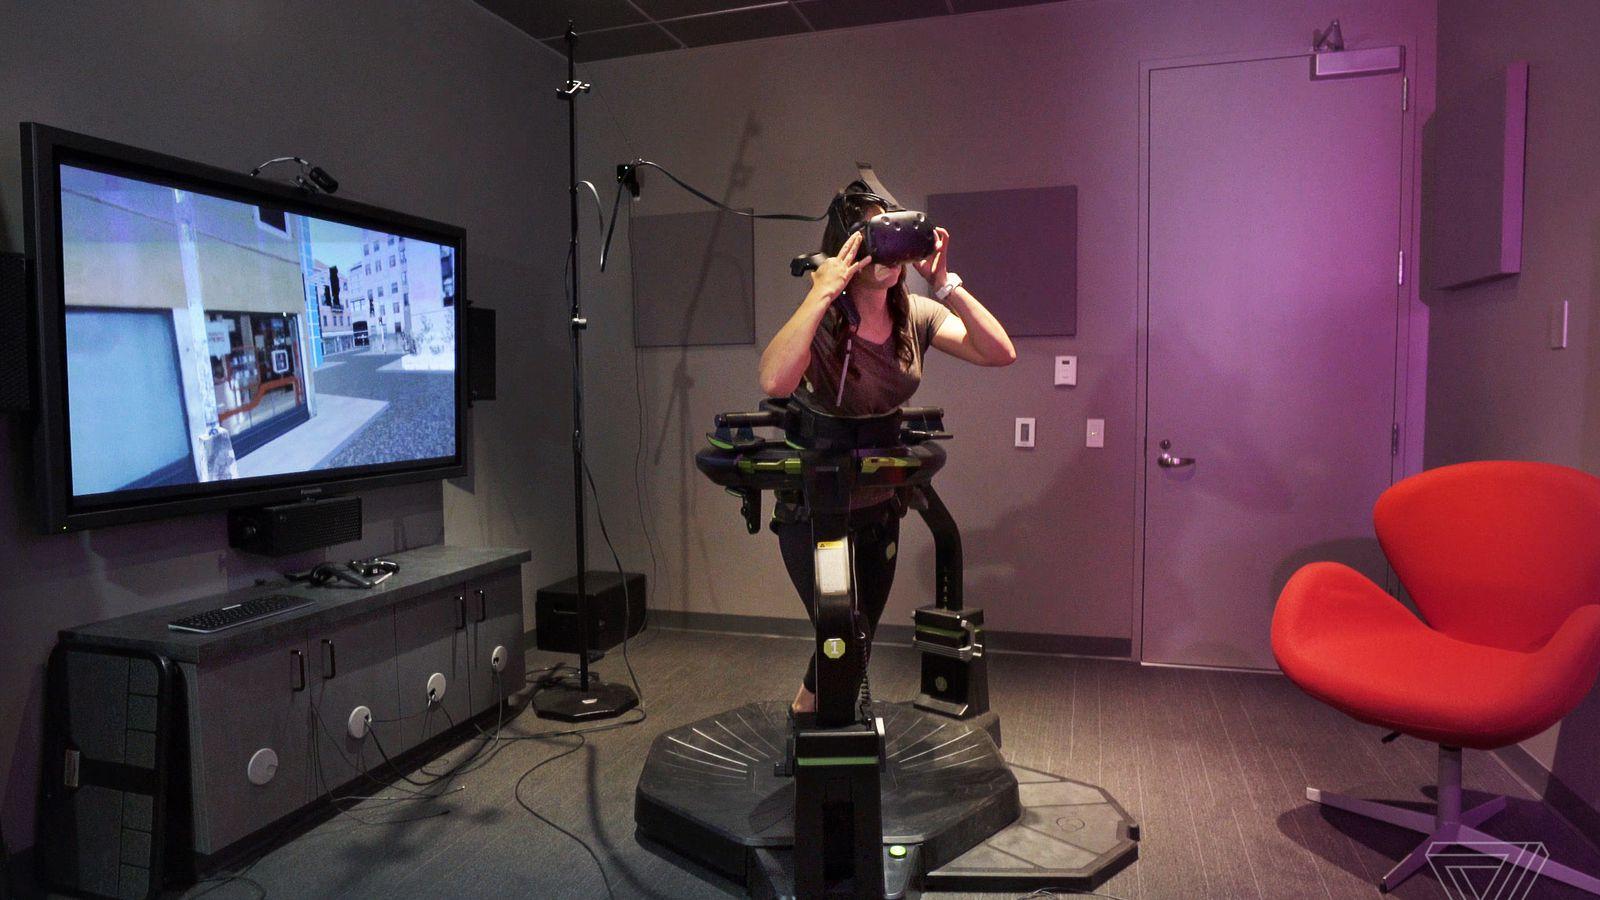 Prescription video games may be the future of medicine